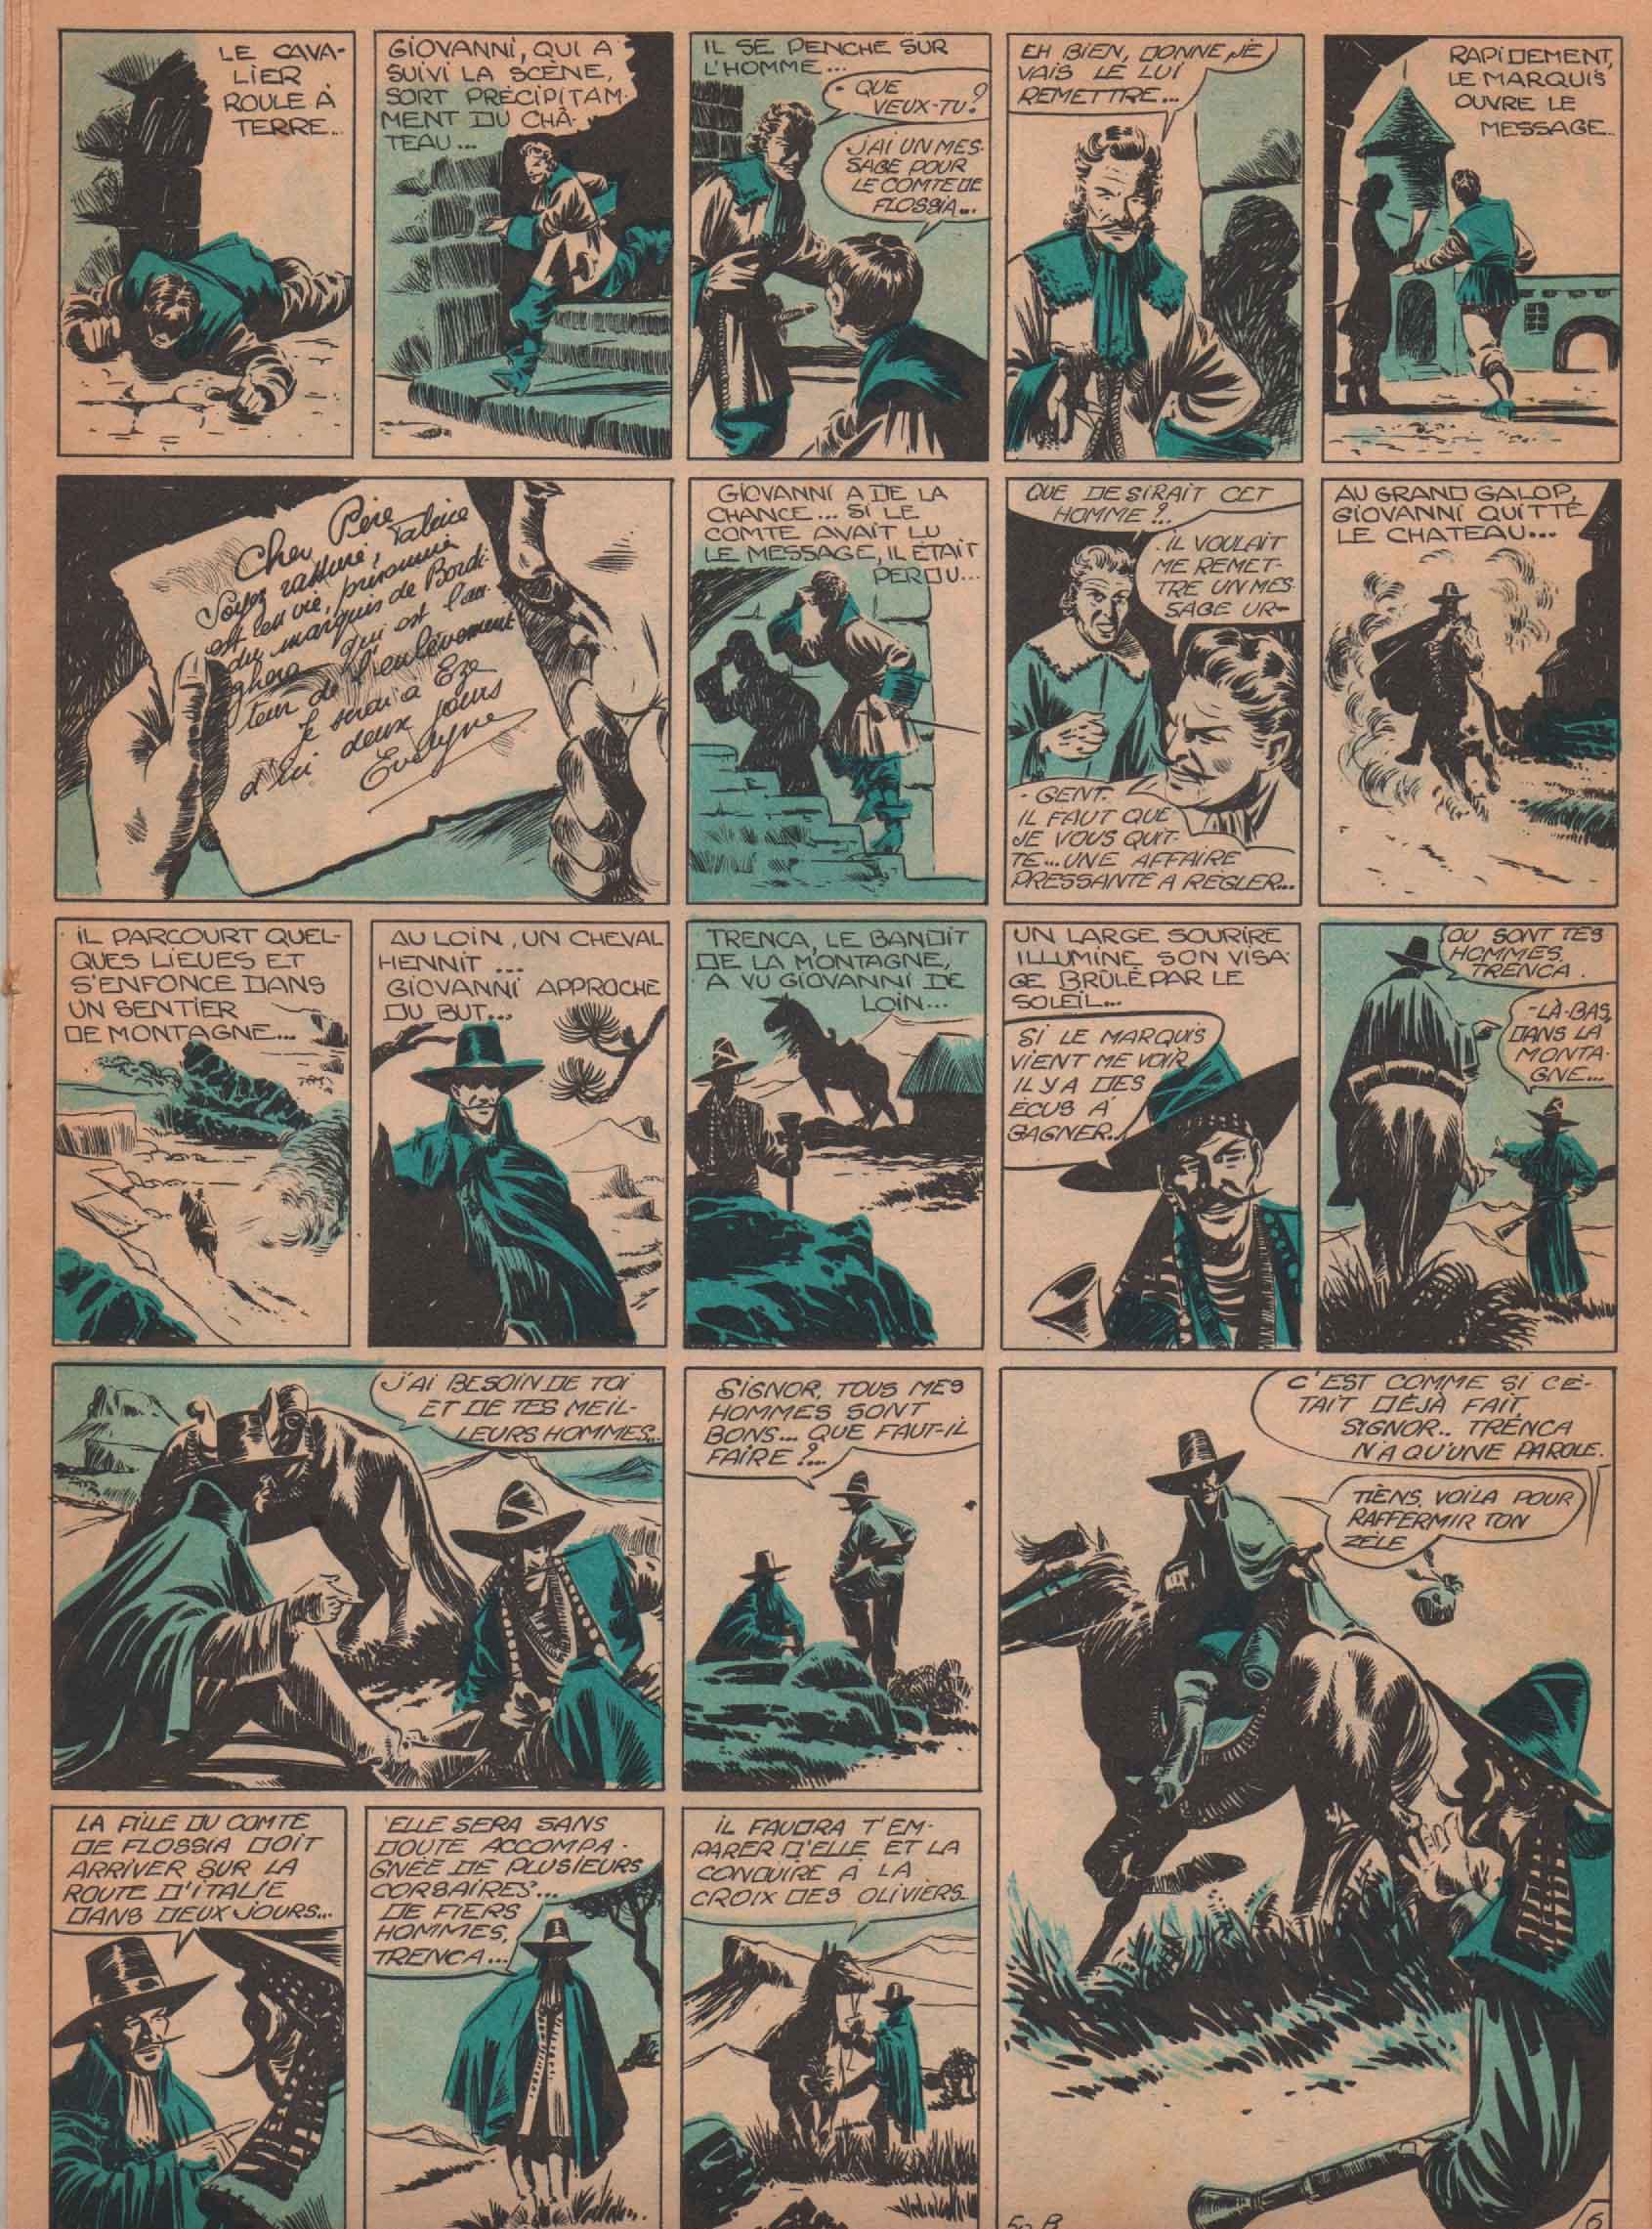 « Capitaine Tornade » L'Invincible n° 50 (12/10/1953).